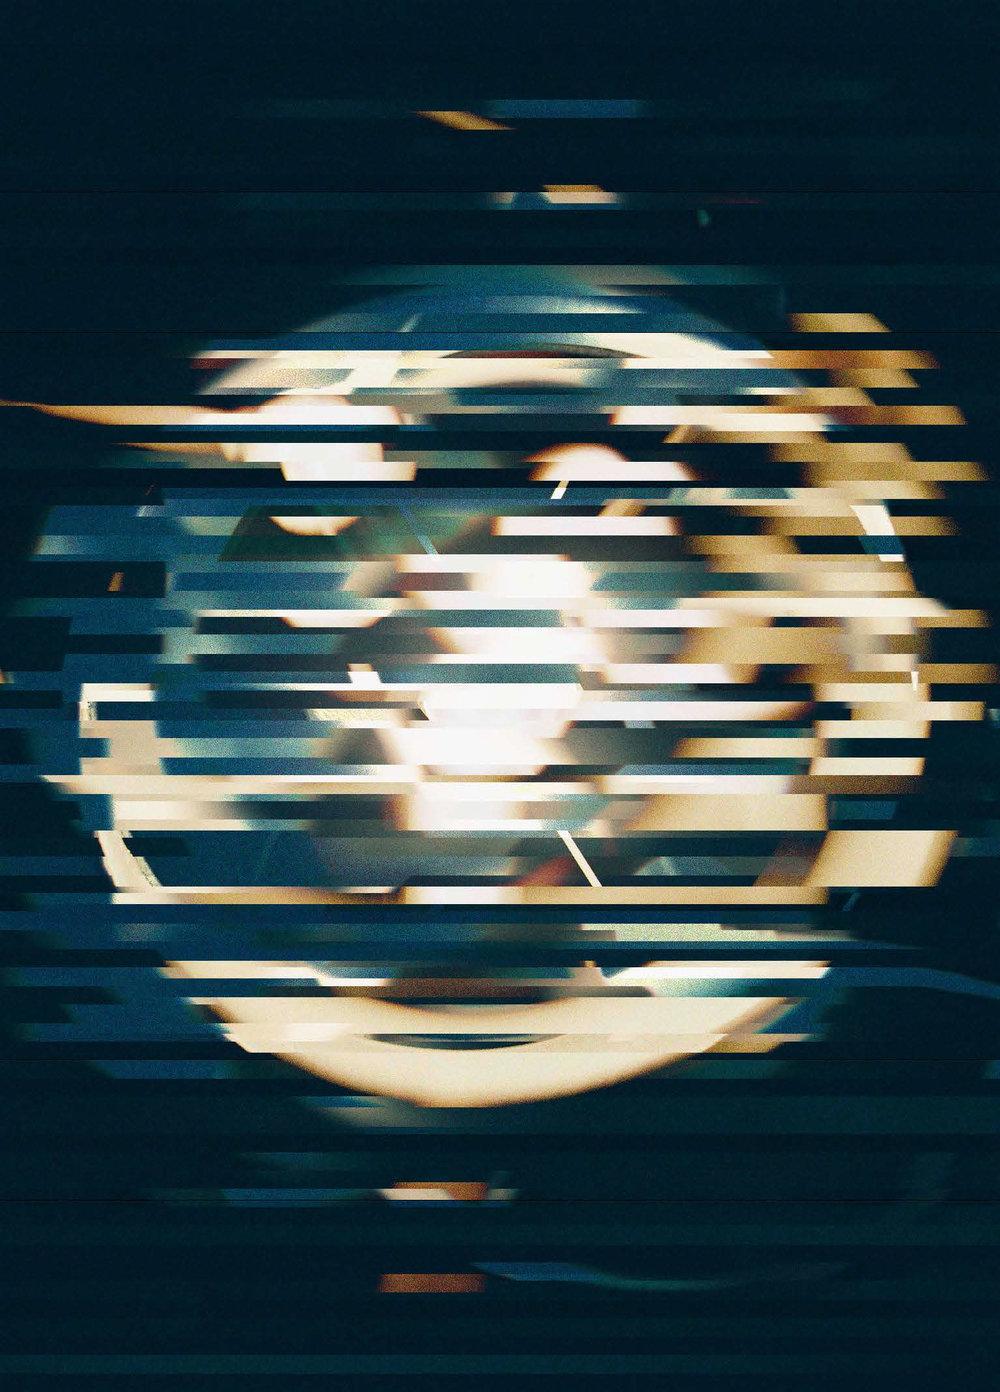 Pinlight Multiverse, 2012 12 x 16.7 inches film photograph, digitized . digital art